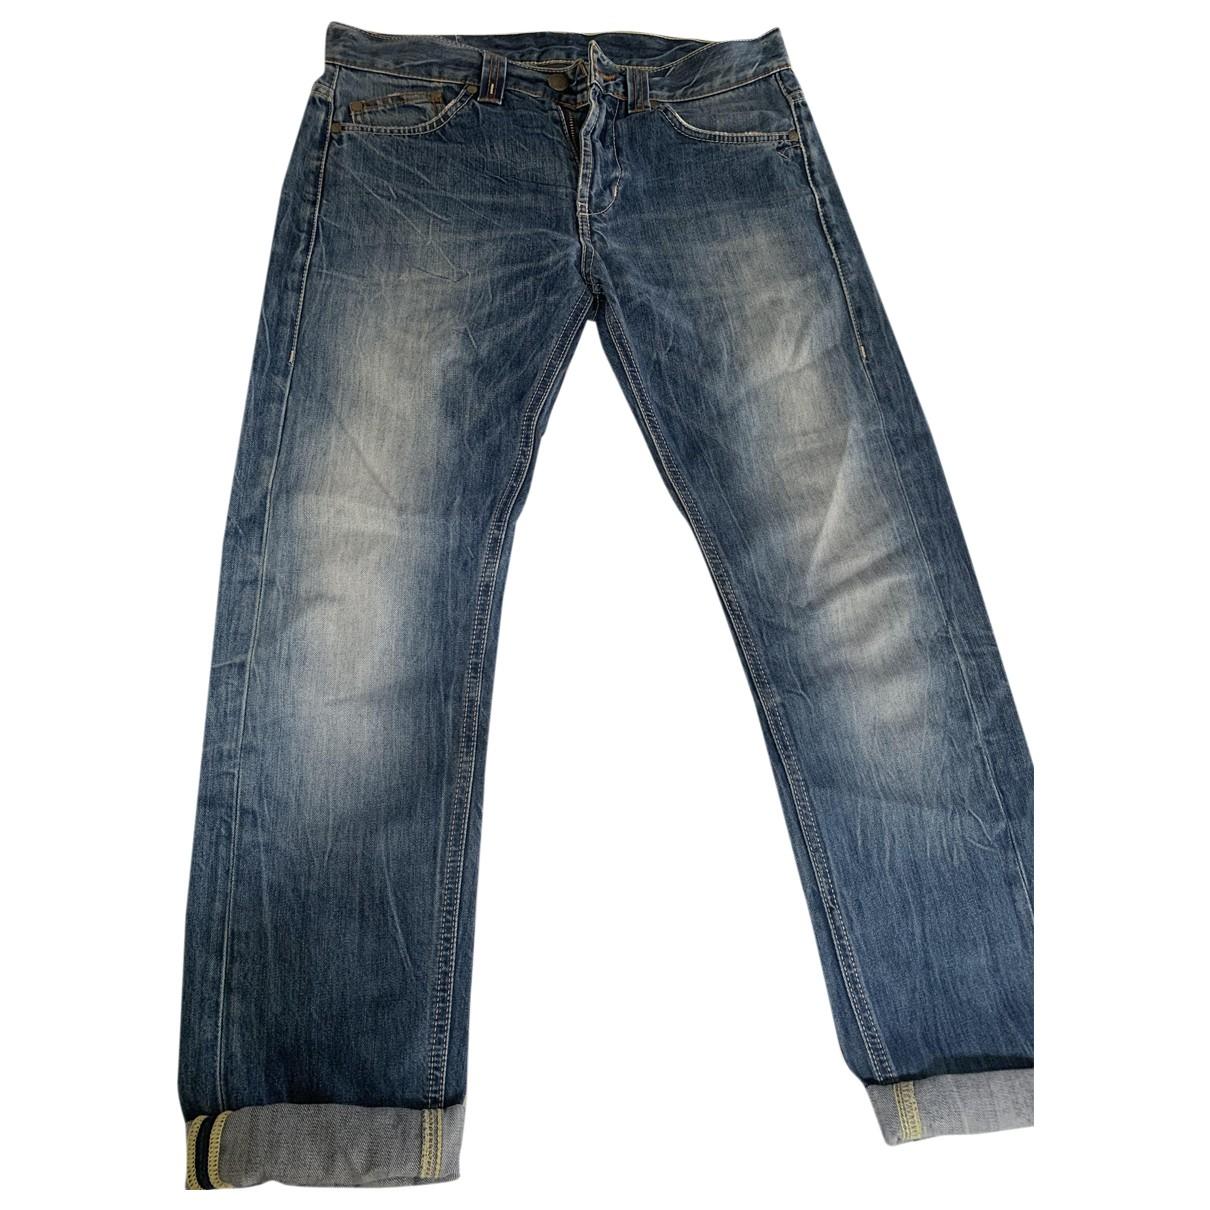 Dondup \N Blue Denim - Jeans Trousers for Men 32 UK - US